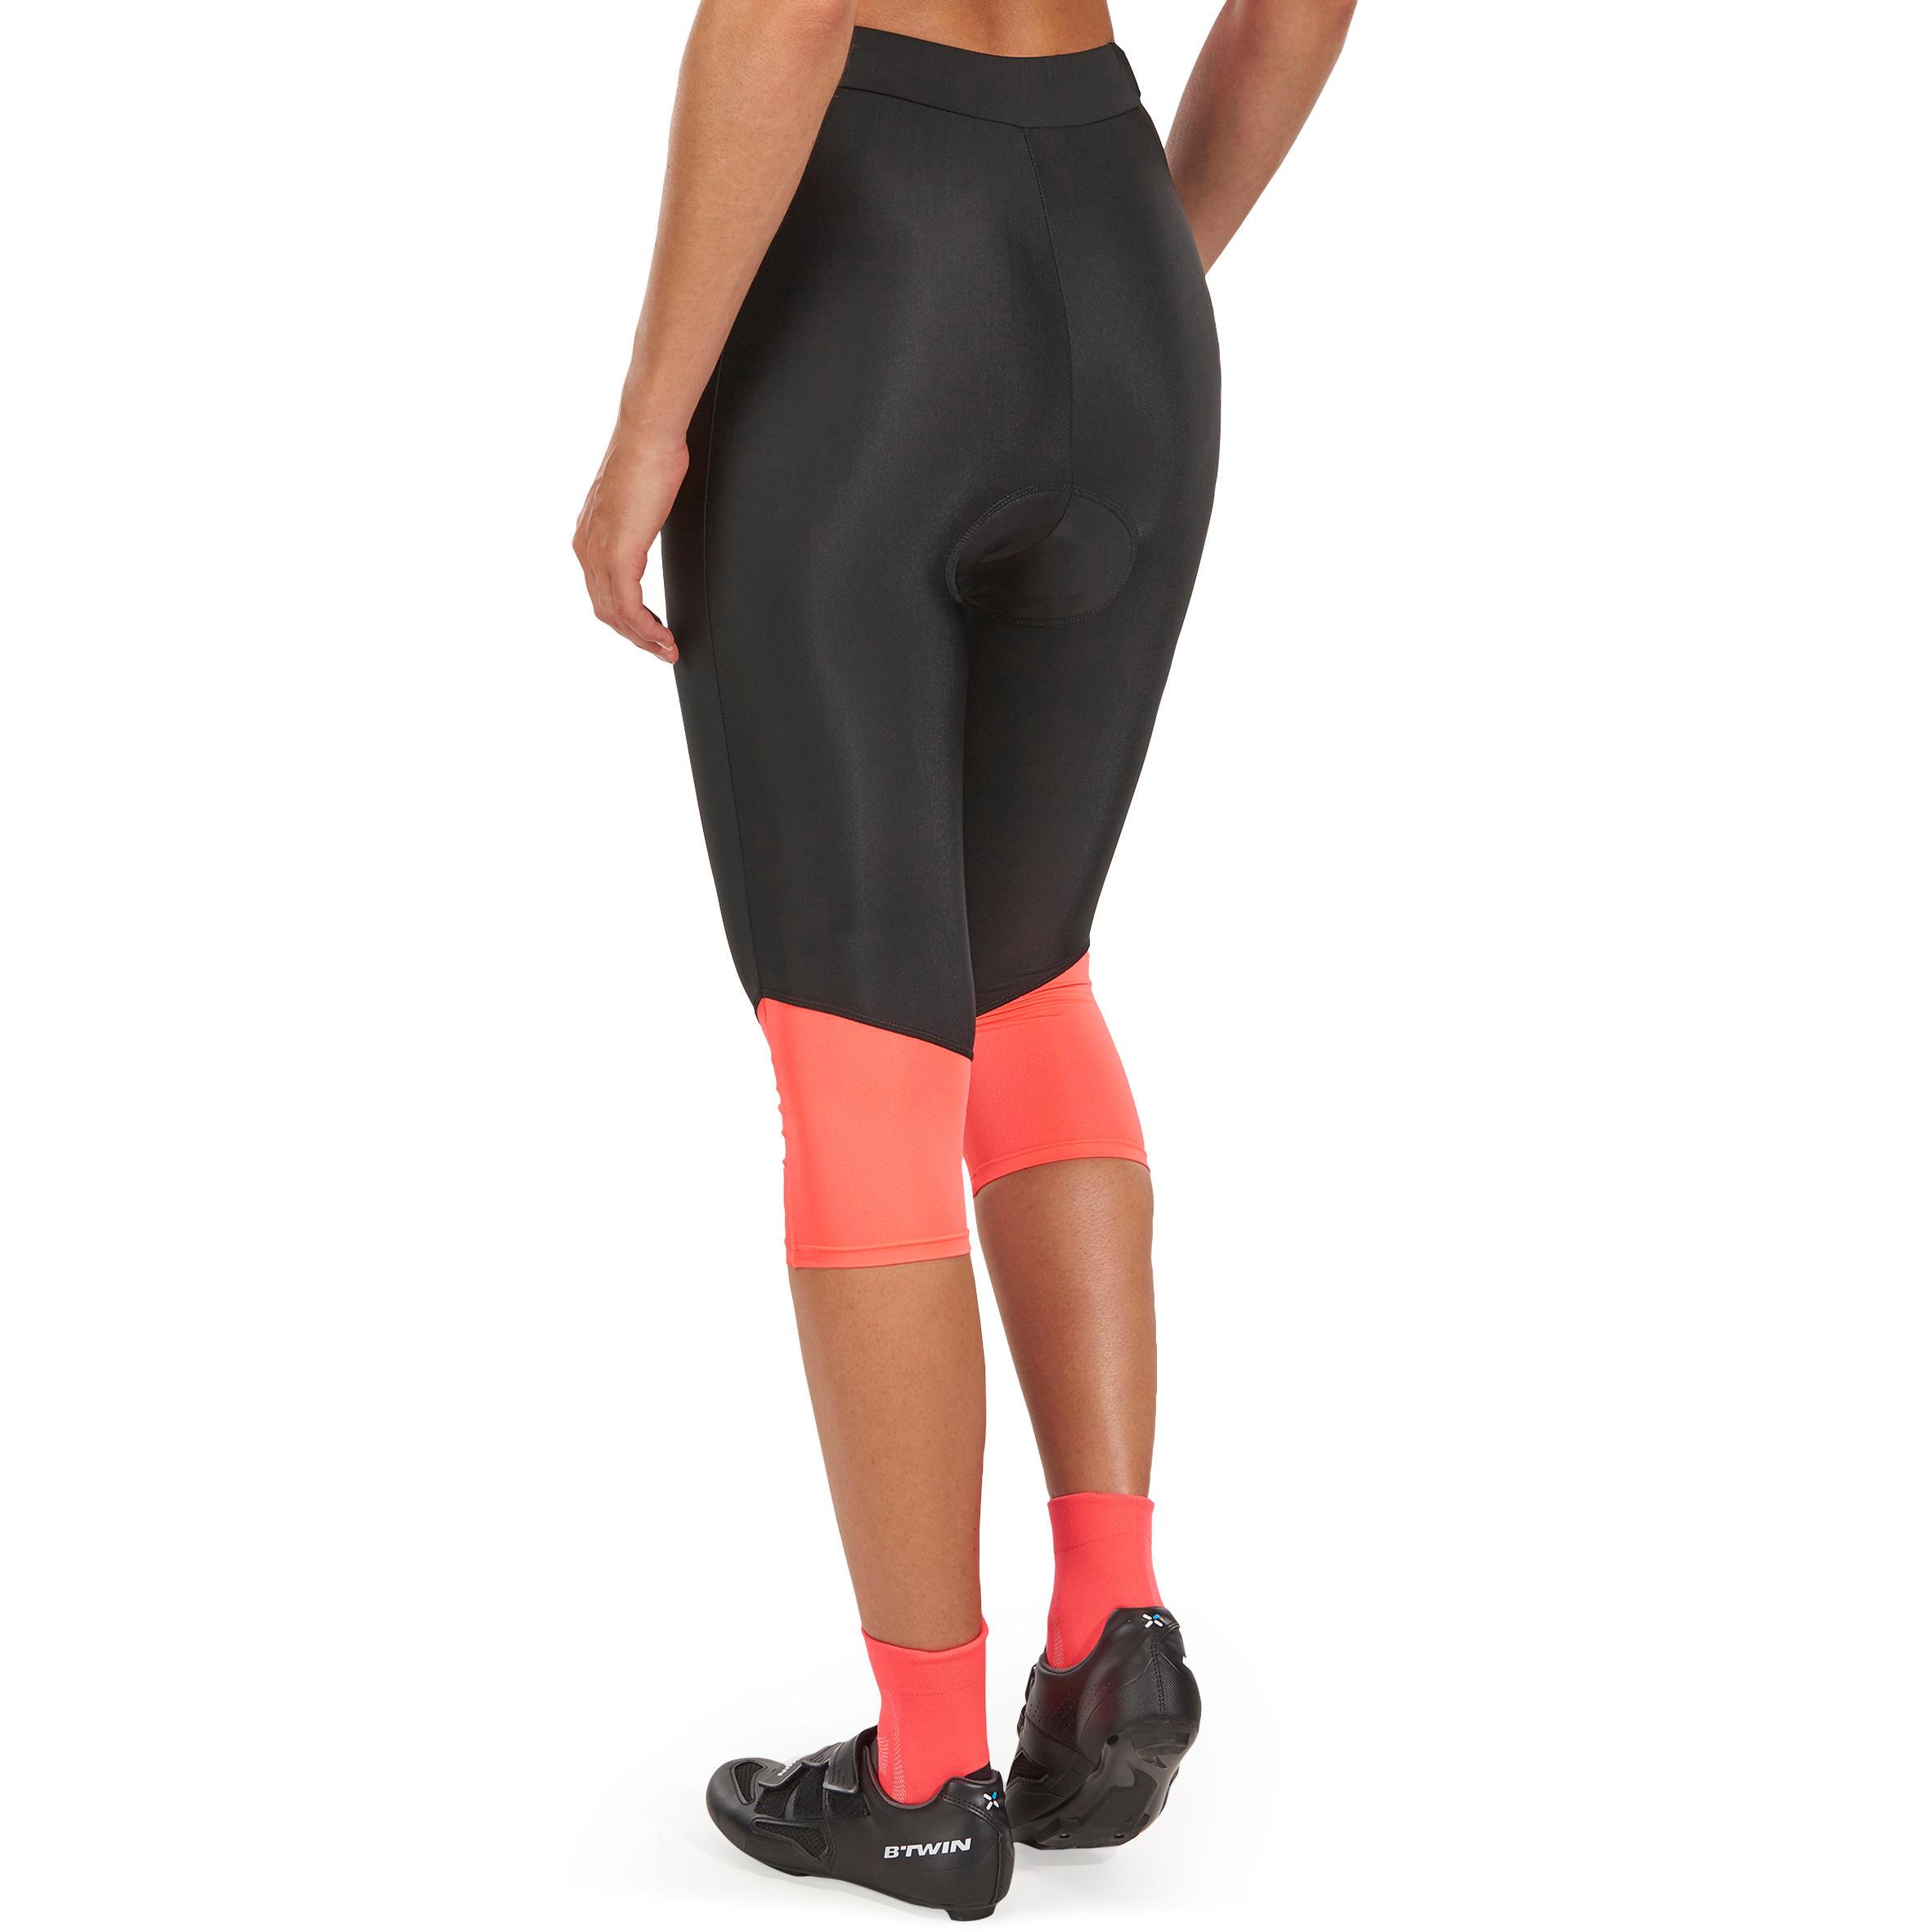 500 Women's Mountain Bike Bibless Cropped Bottoms - Black/Pink